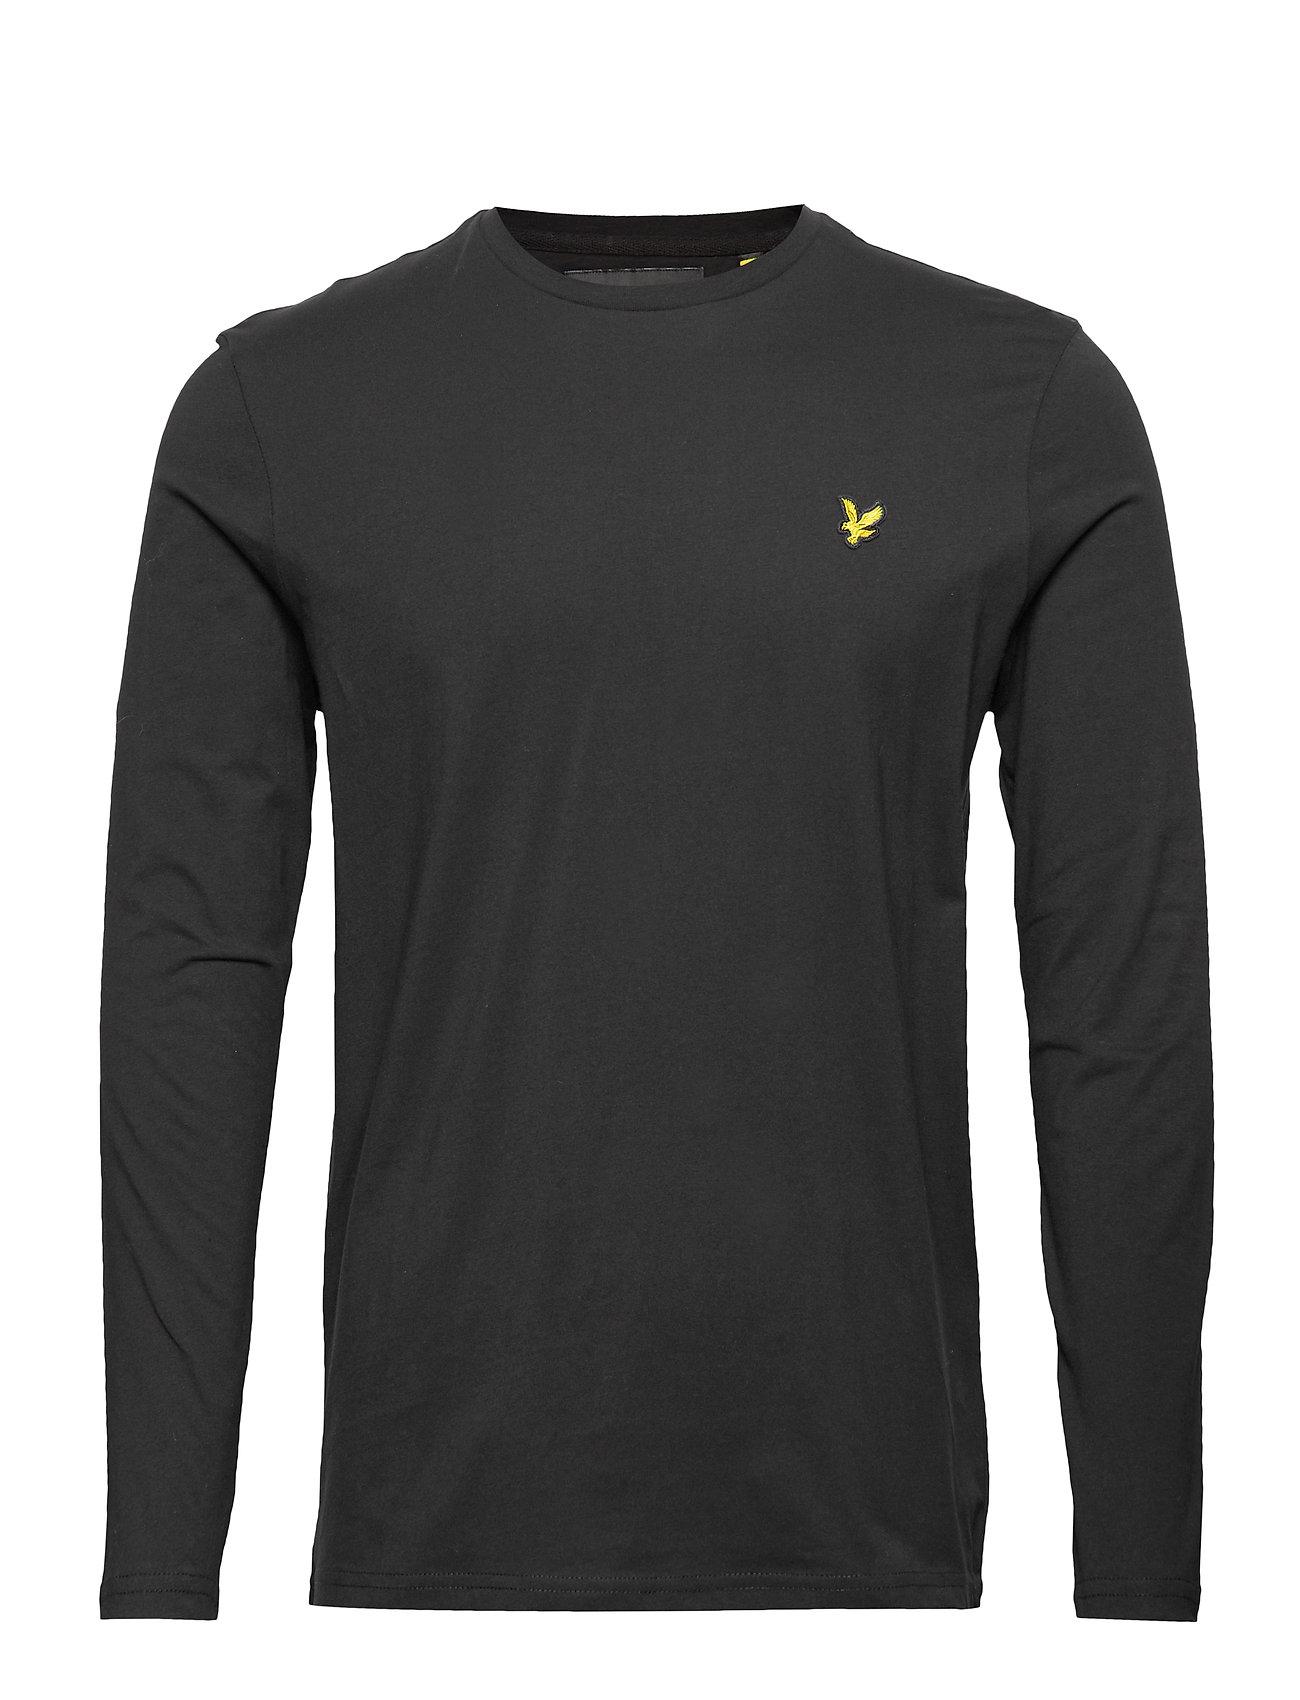 Lyle & Scott LS Crew Neck T-shirt - JET BLACK